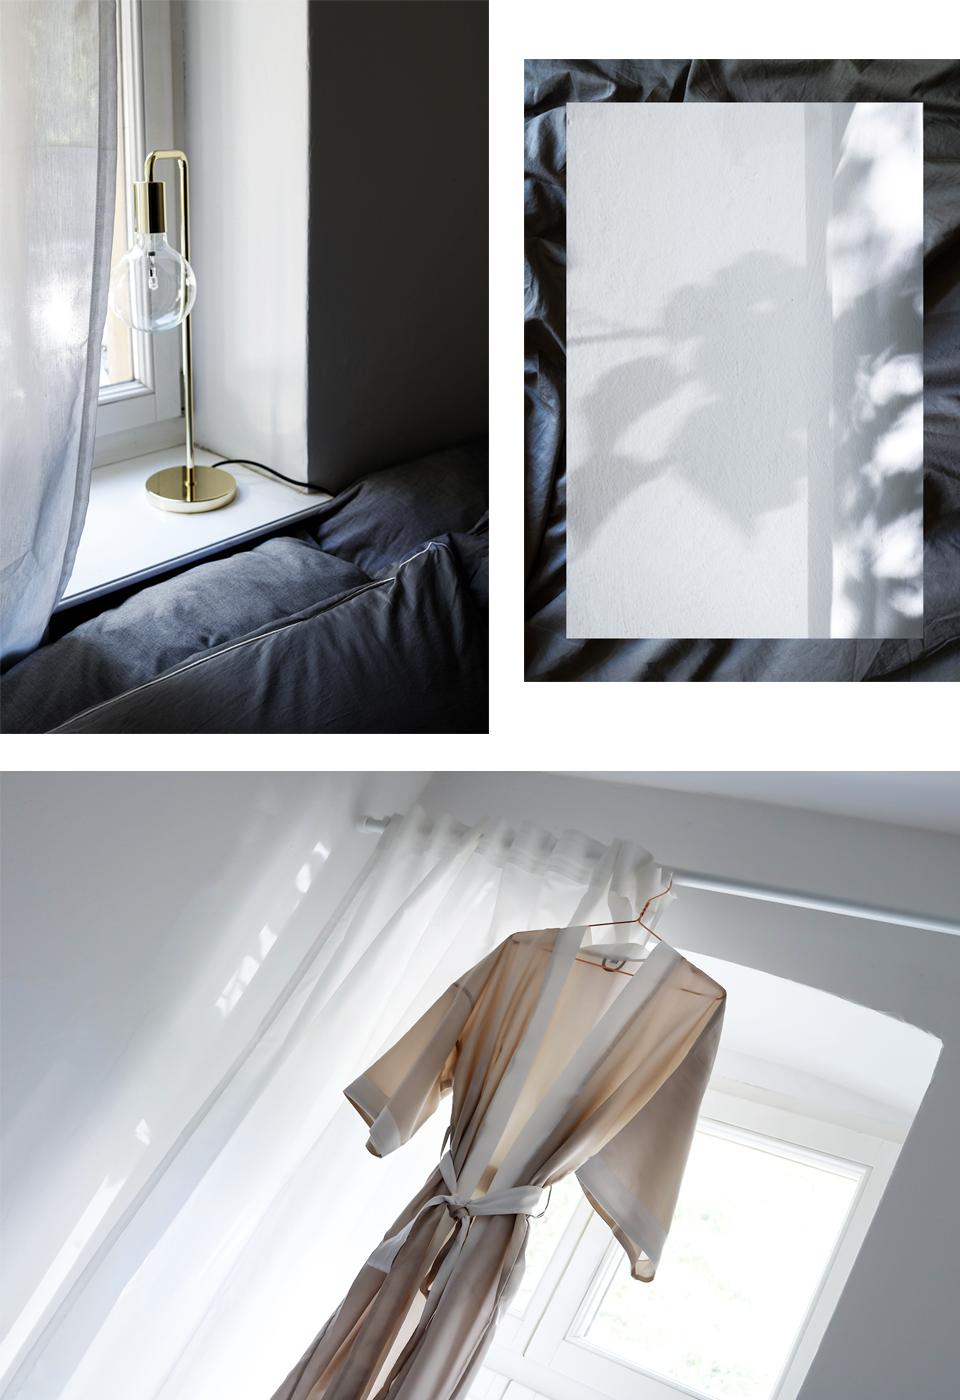 noa-noir-art-interior-minimal-home-inspiration-urbanara-minimalist-bedroom-2 (1).png